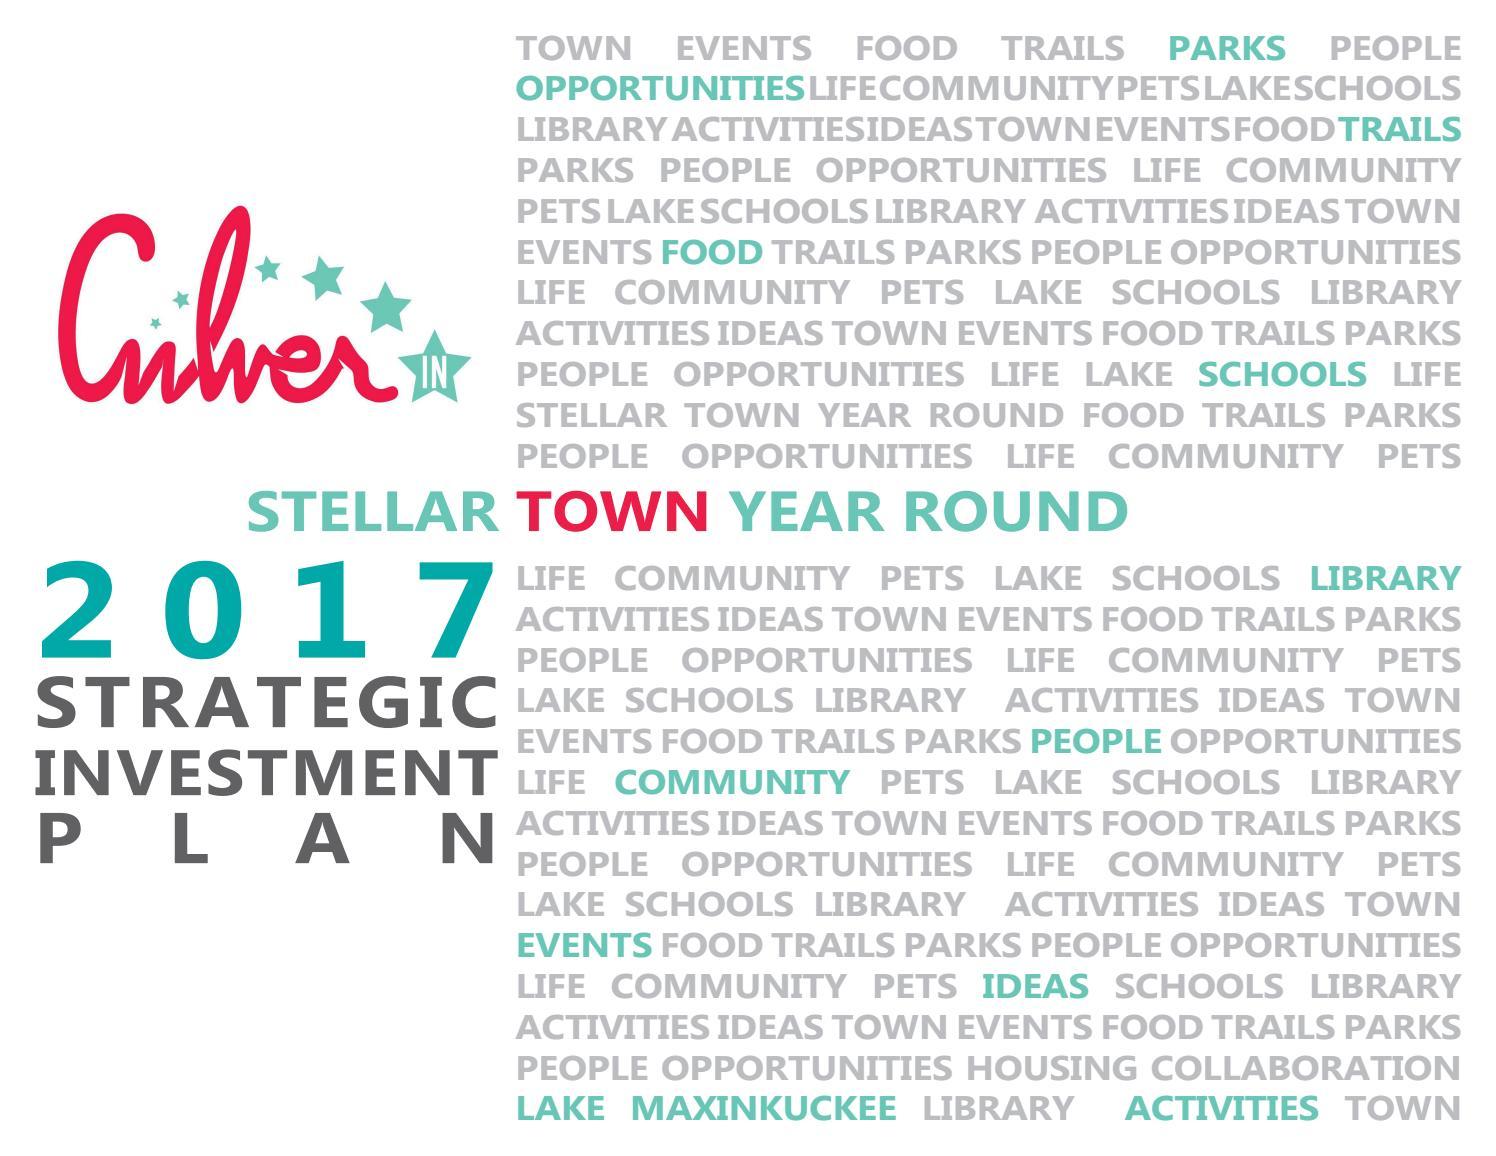 Iusb Spring 2020 Calendar.Culver Strategic Implementation Plan By Troyer Group Issuu